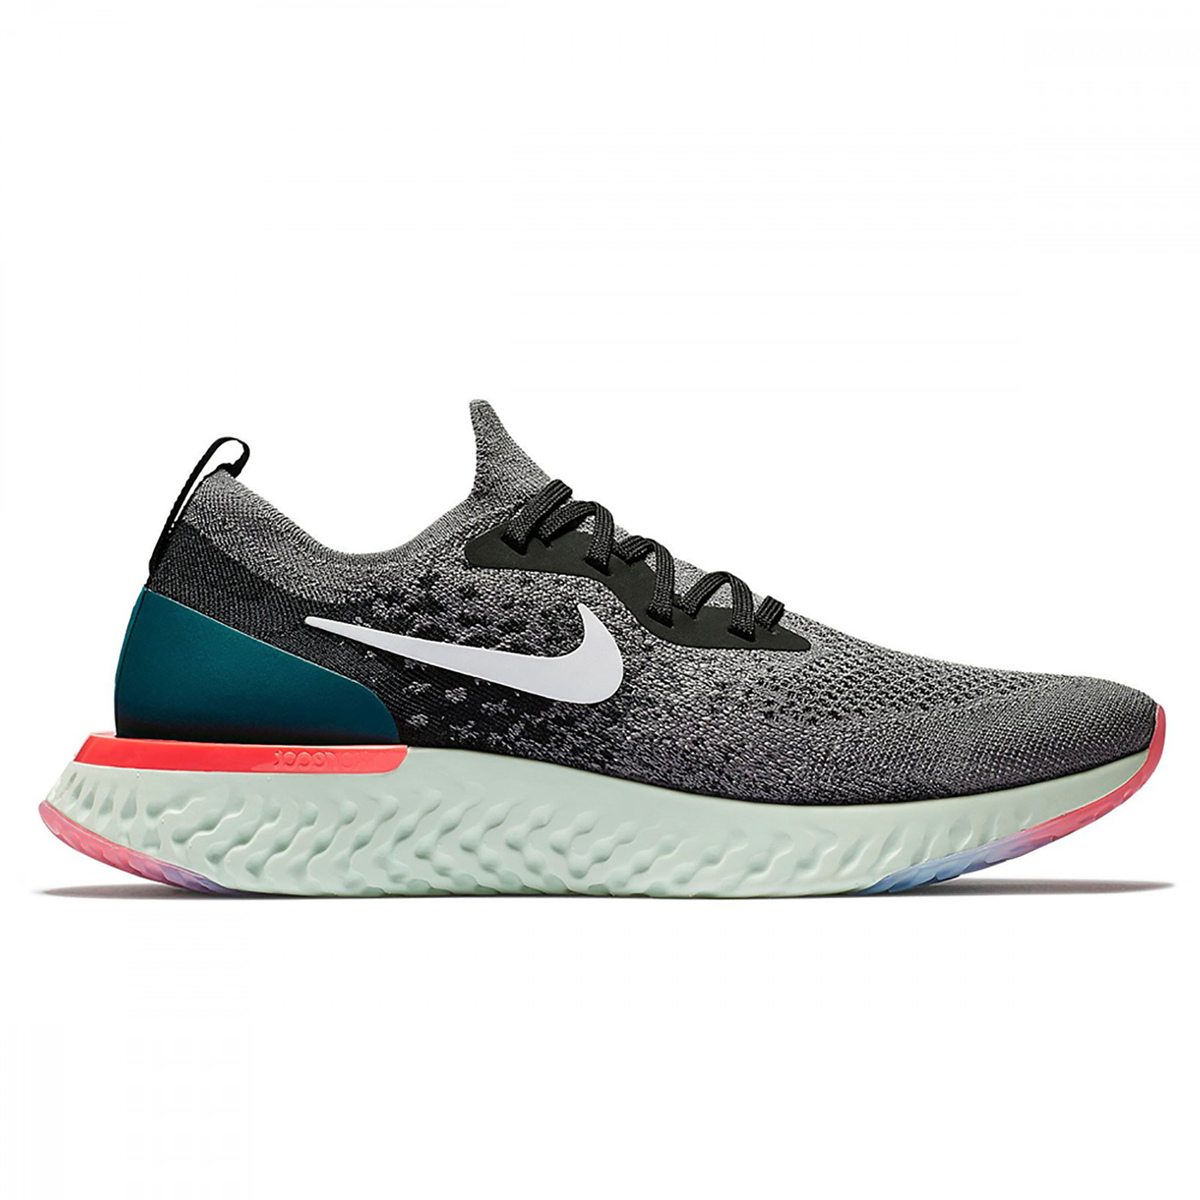 Flyknit Offerte Delle Prezzi Maxi Nike React Epic Economiche Sport IwBqHw7